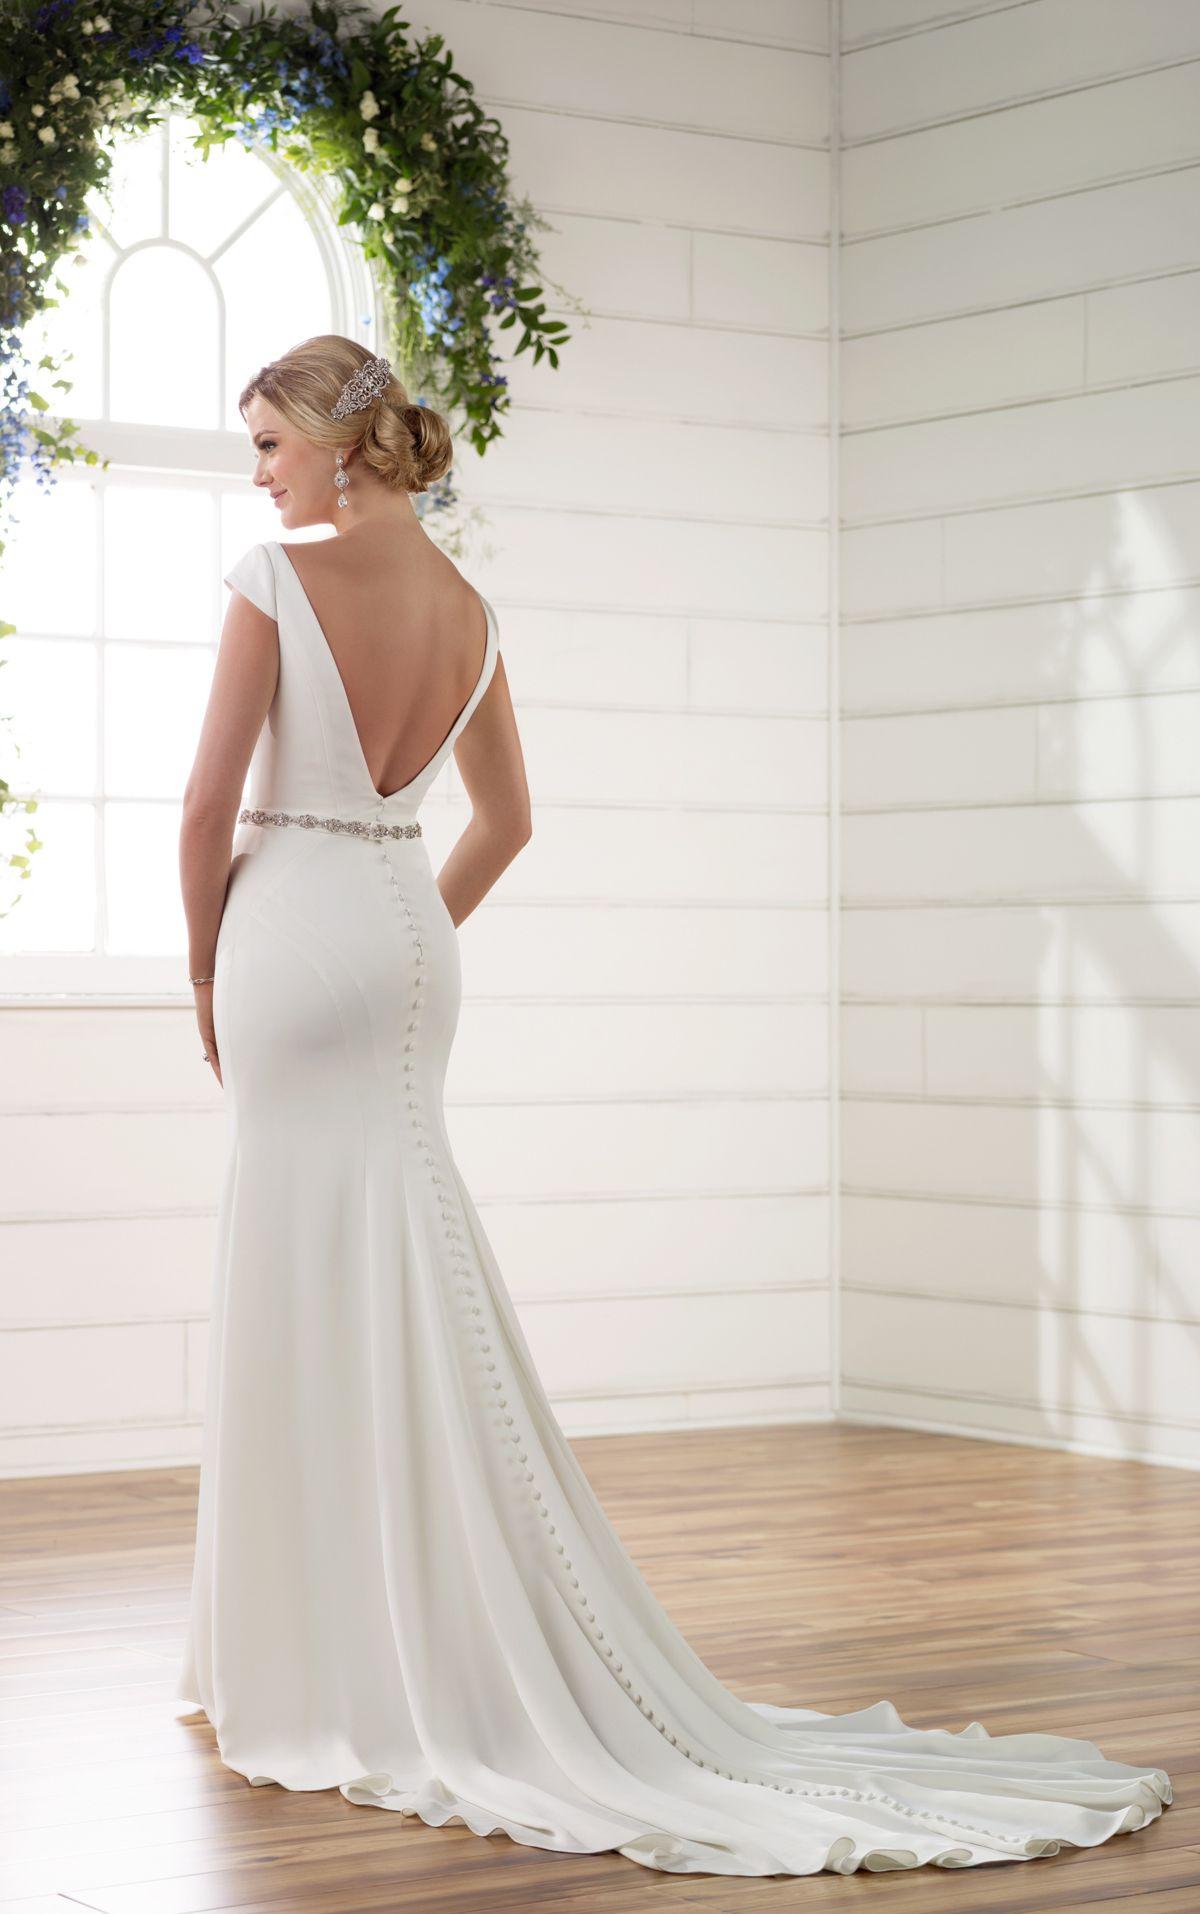 Boat neck wedding dress with cap sleeves vback boat